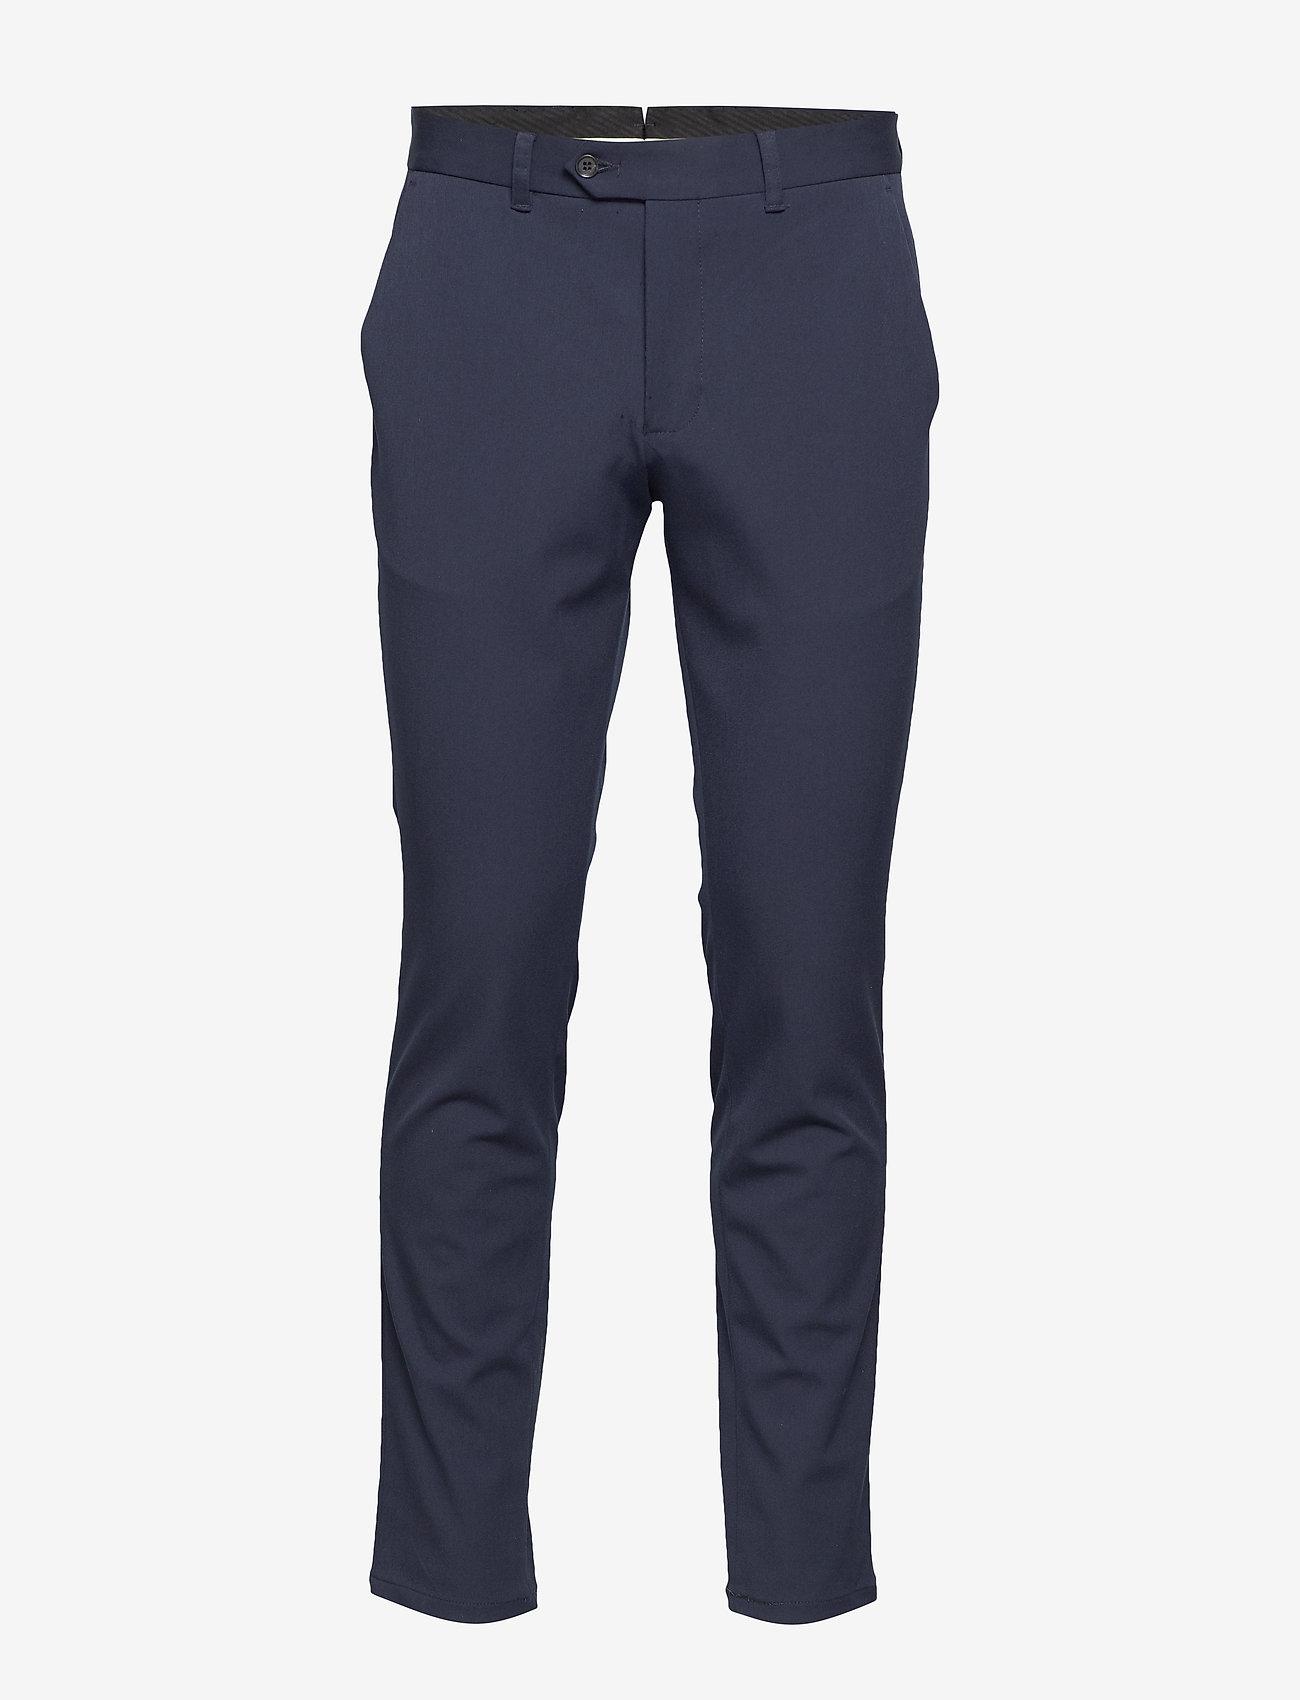 Selected Homme - SLHSLIM-CARLO FLEX PANTS B NOOS - suitbukser - navy blazer - 0